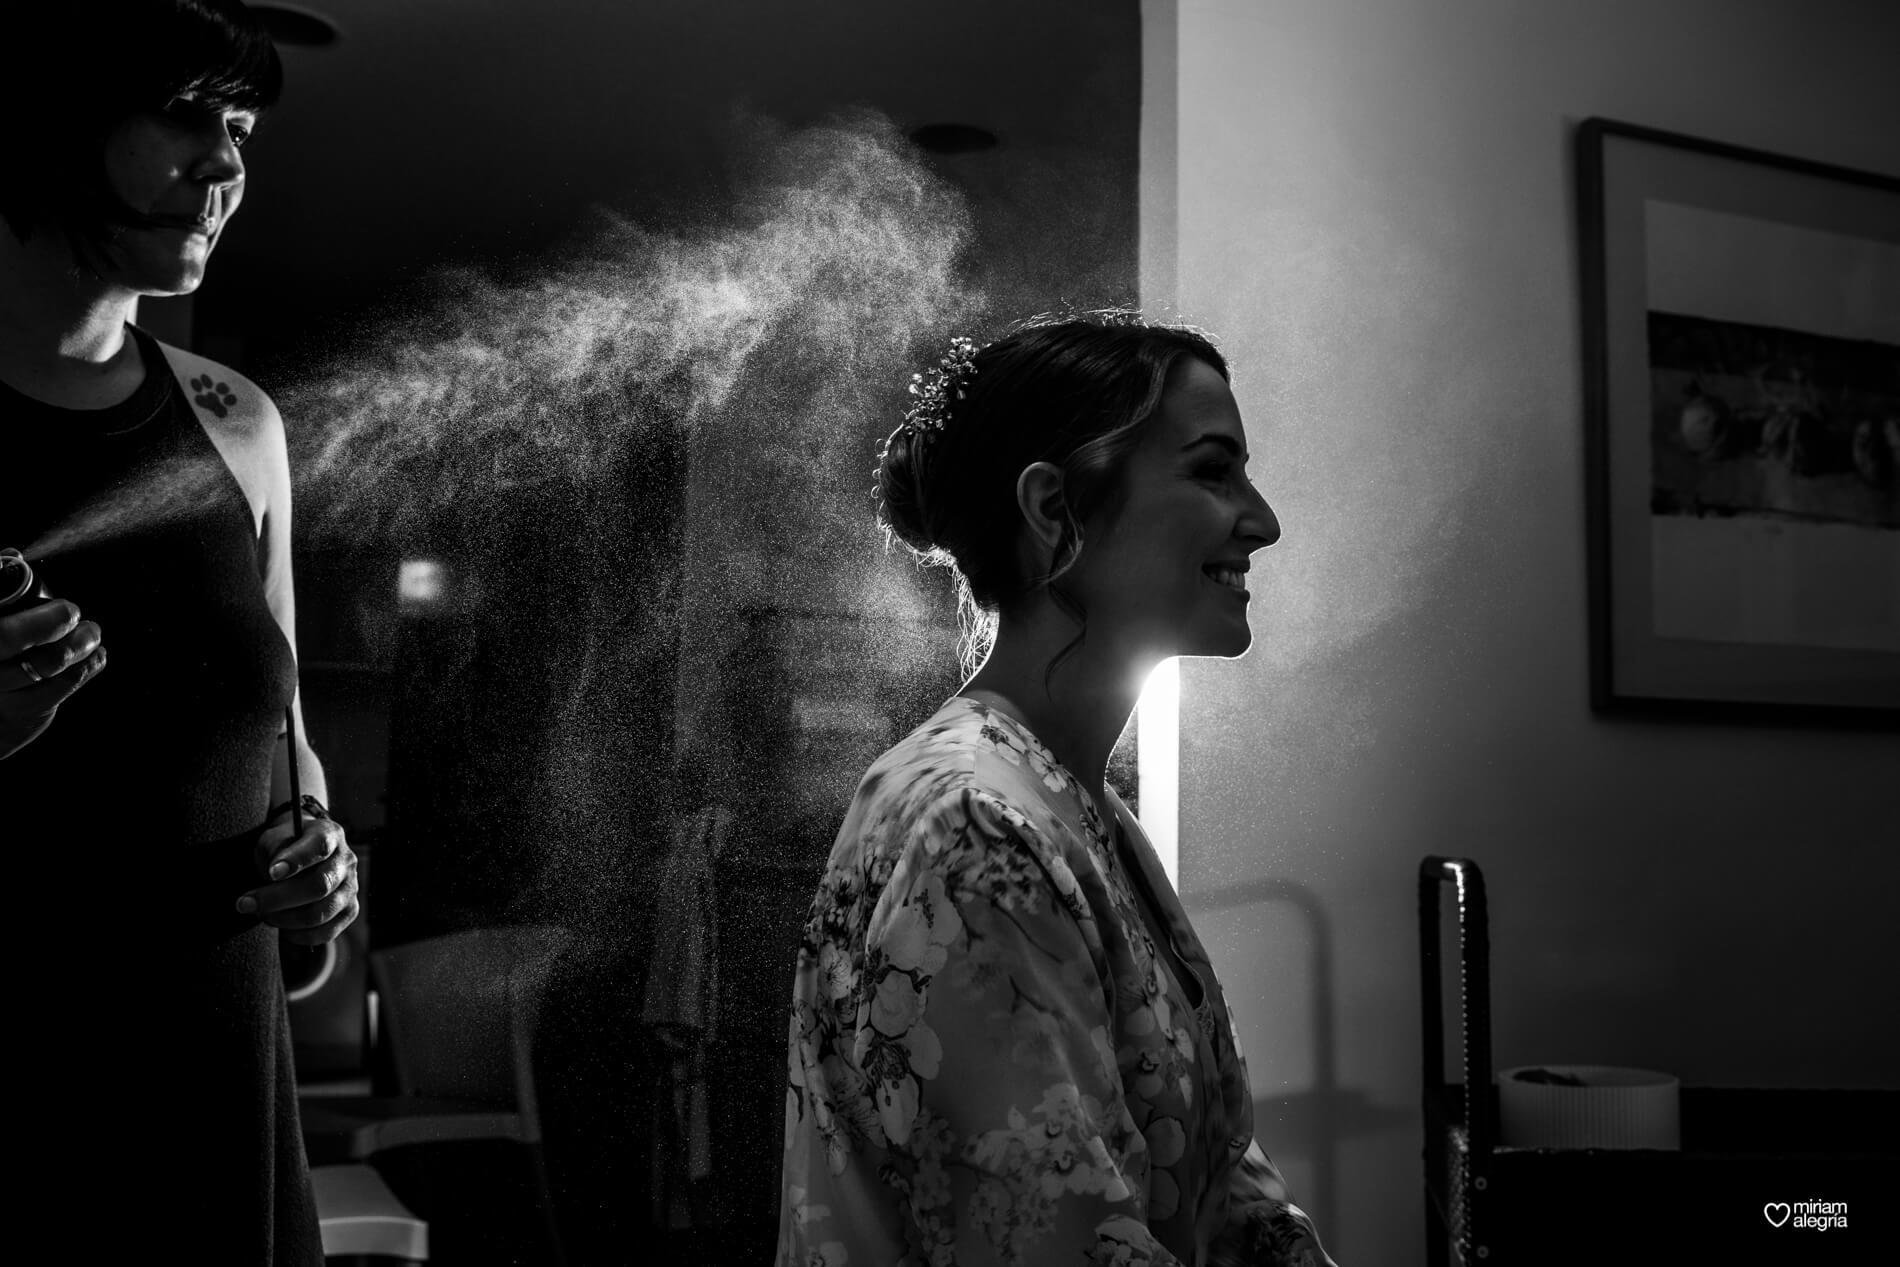 vestido-de-novia-paula-del-vas-miriam-alegria-fotografos-boda-murcia-14